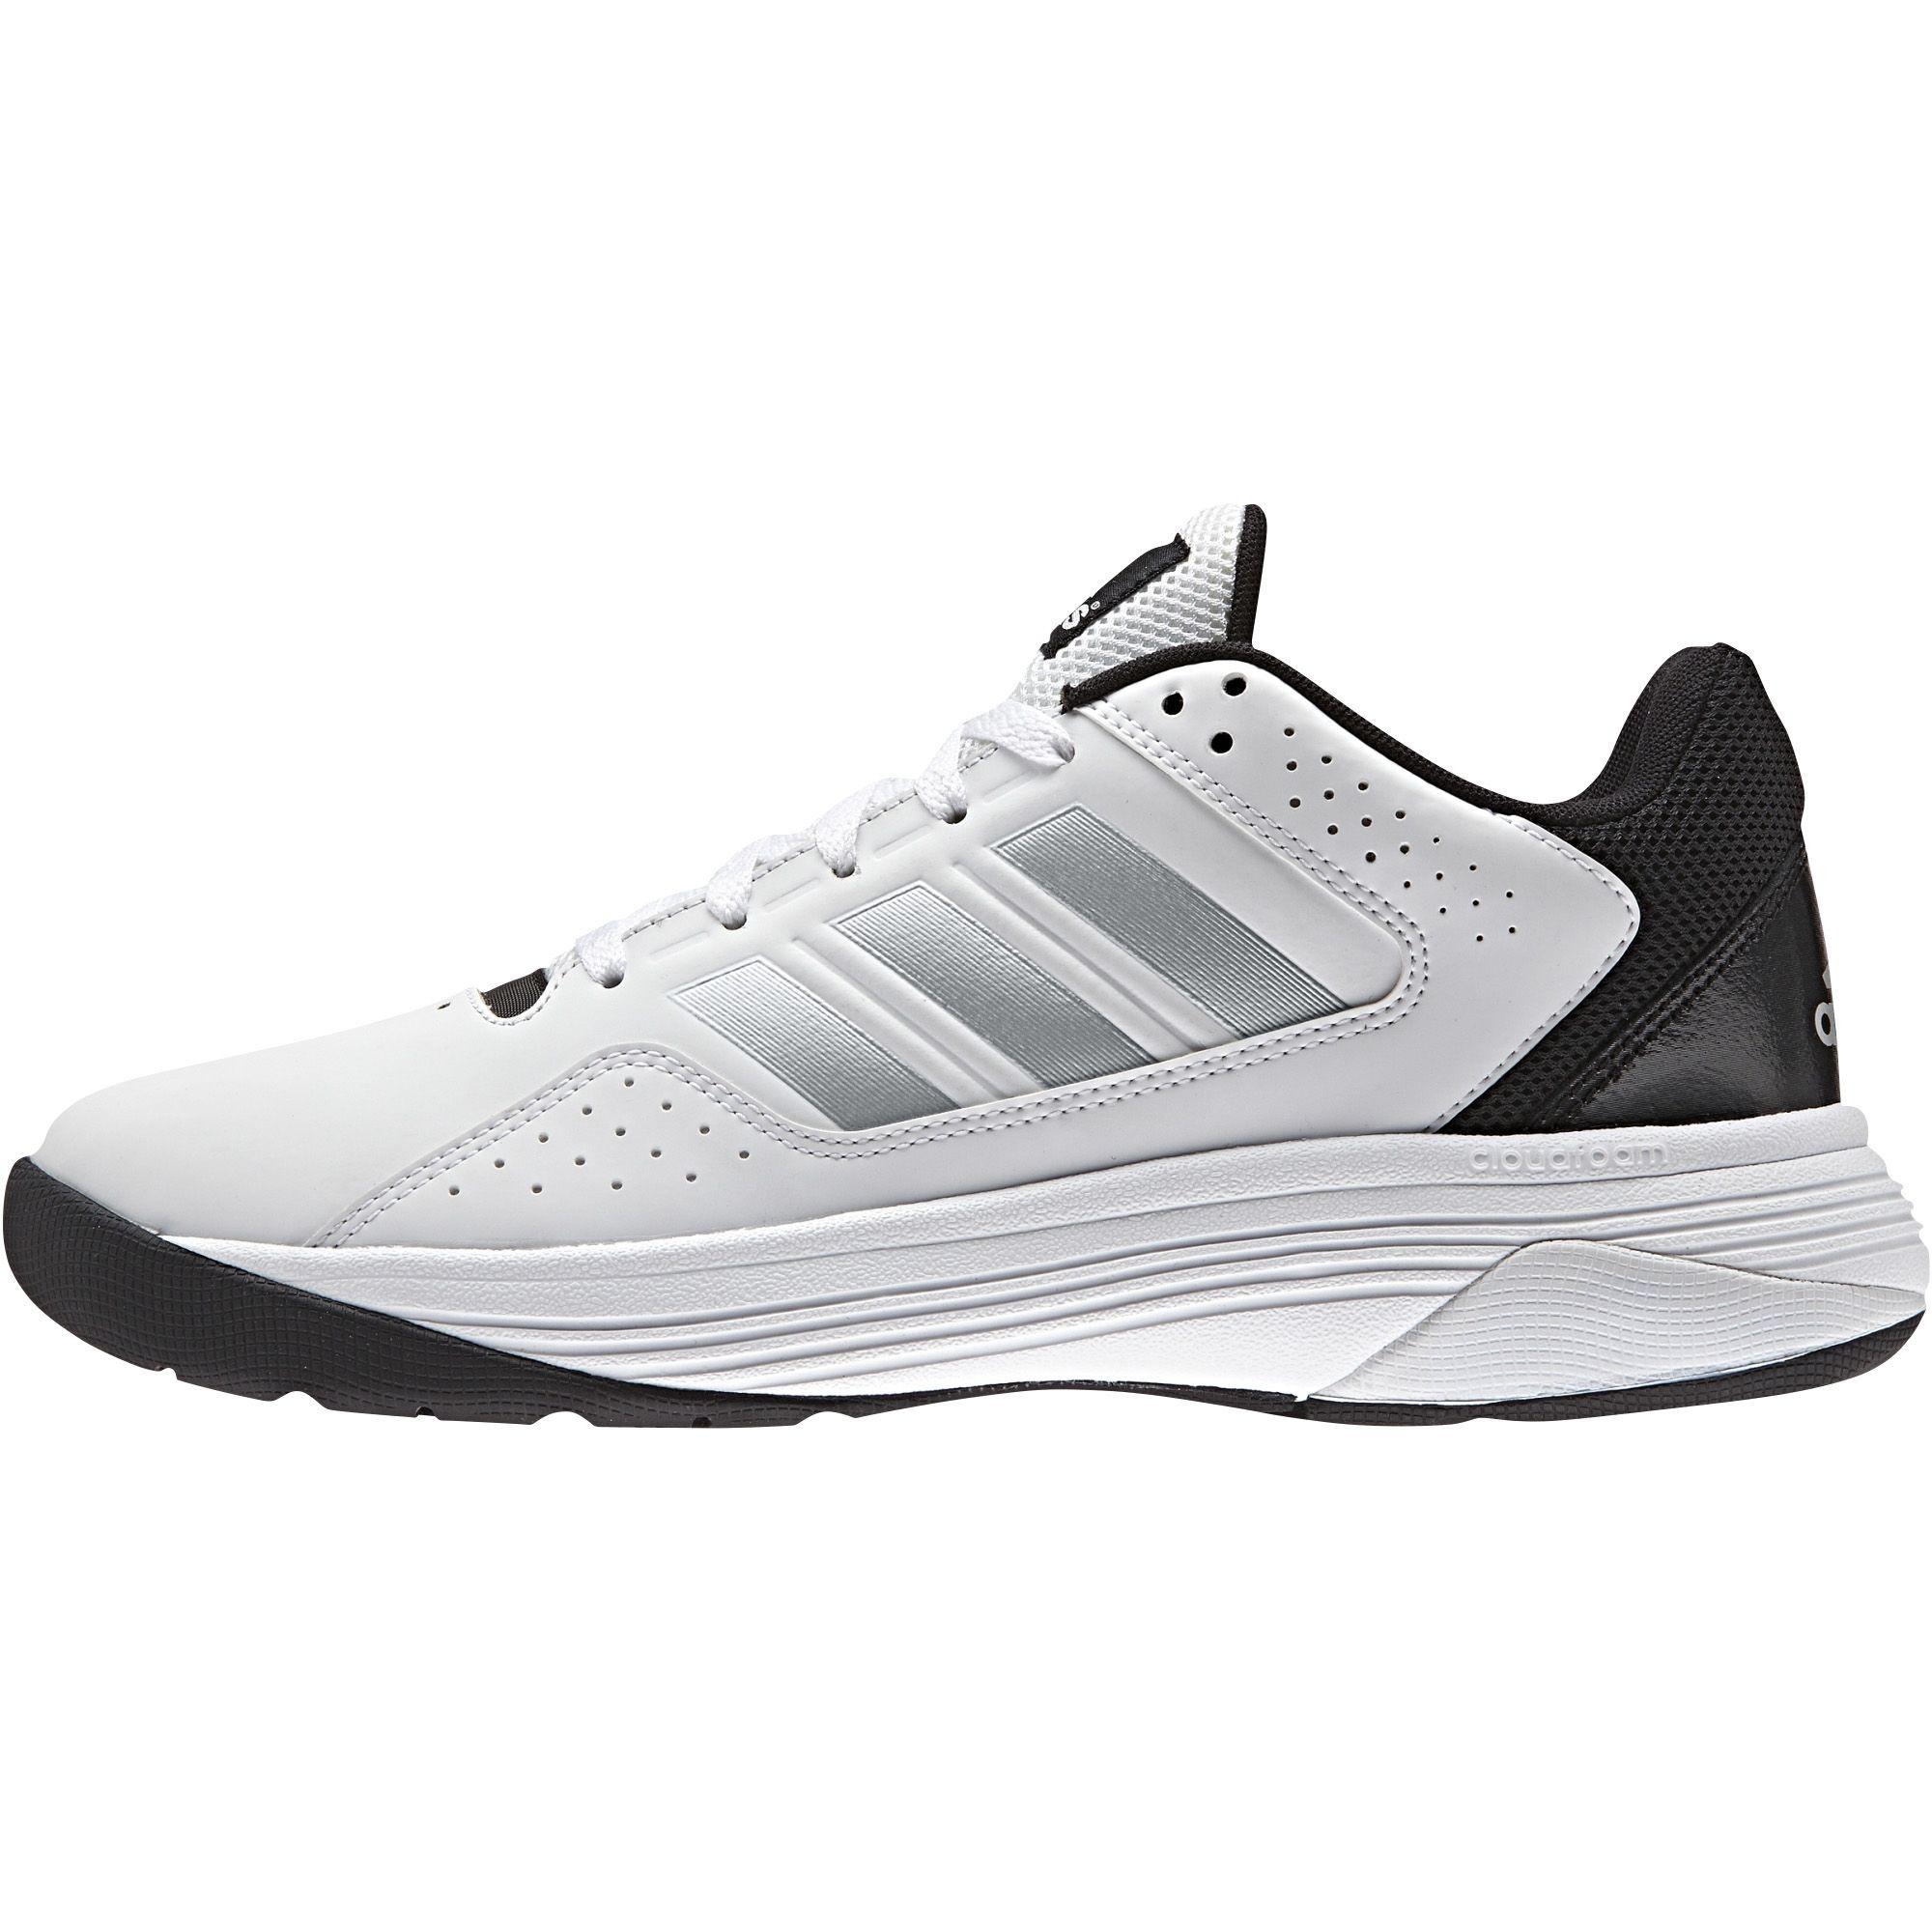 adidas Neo Men's Cloudfoam Ilation Low Basketball Shoe